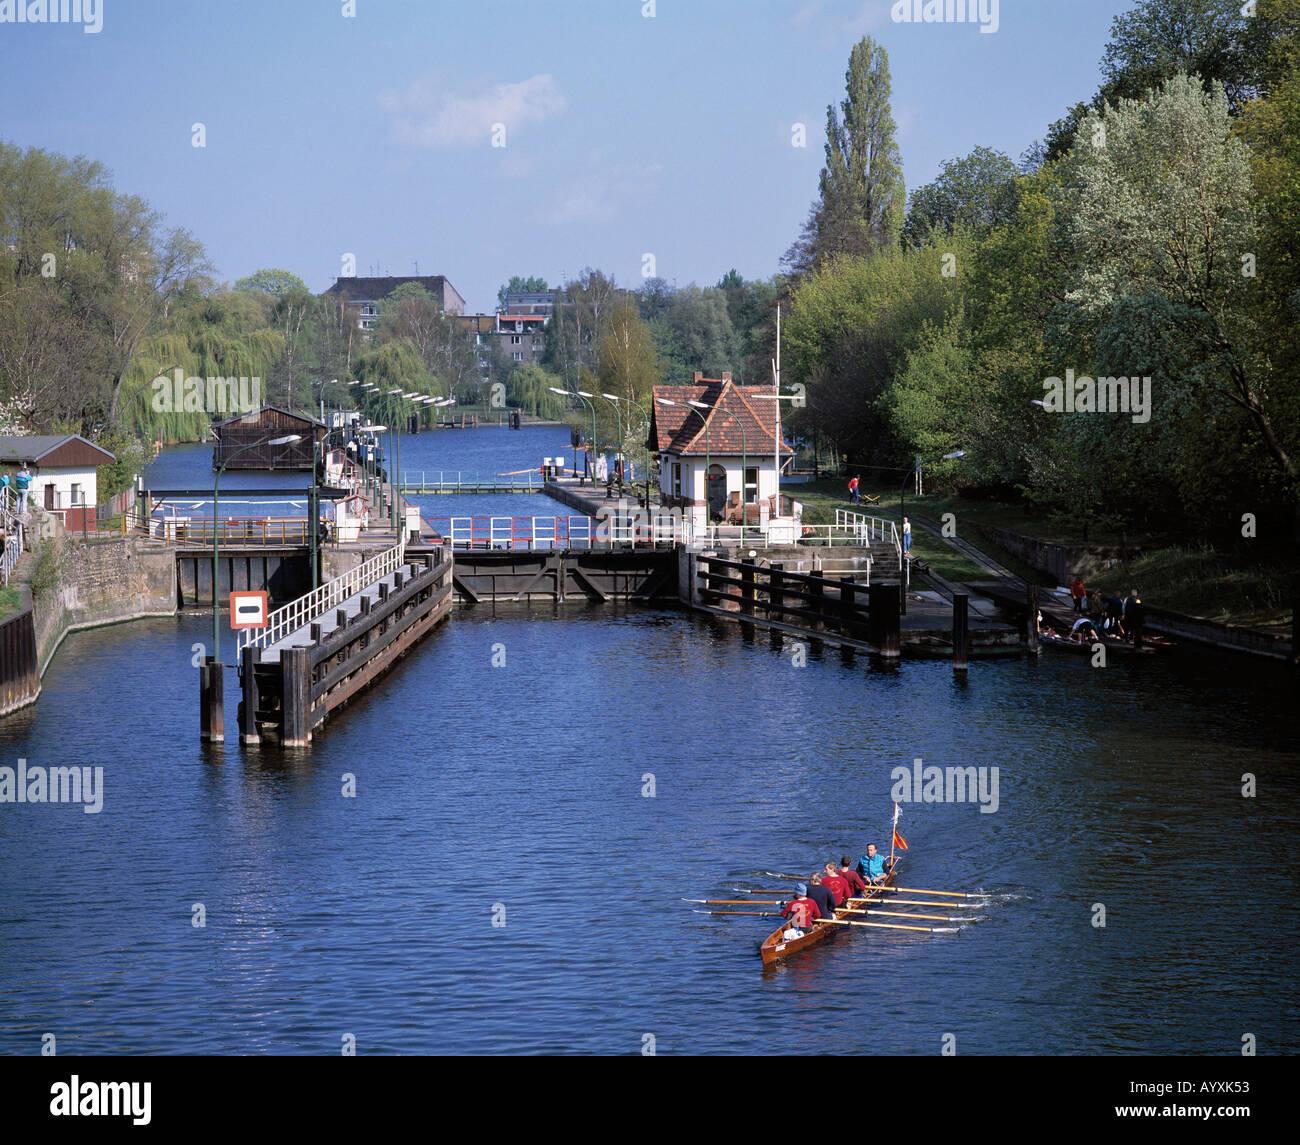 D-Berlin, D-Berlin-Spandau, Havel lock, rowing boat, four coxed, swain, sports, water sports - Stock Image